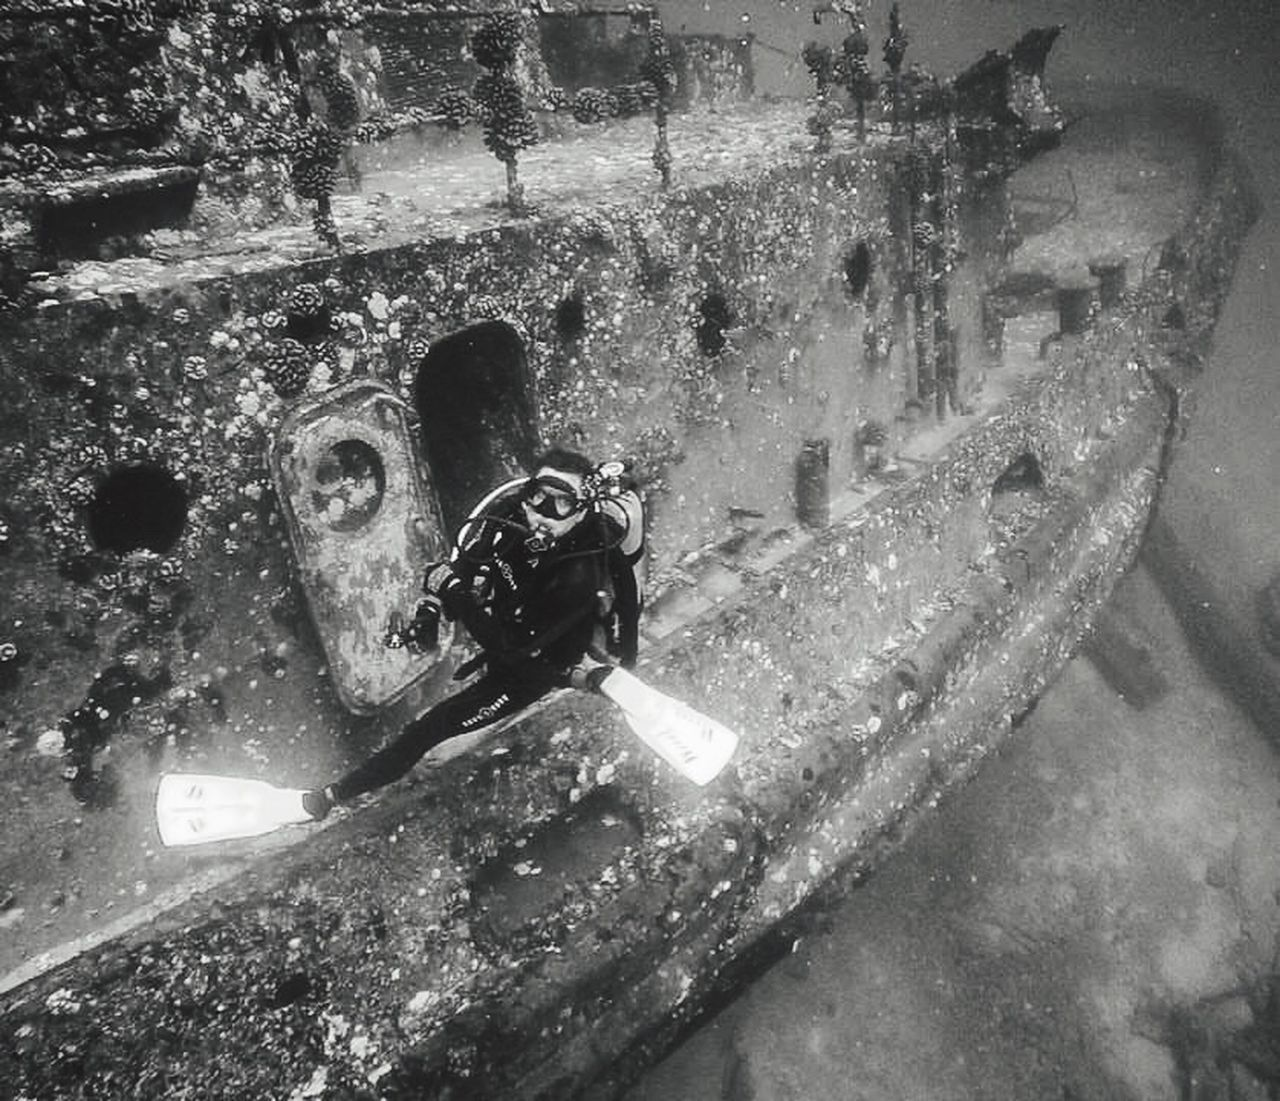 Underwater Photography Padi Scuba Diving SCUBA Wreck Diving Underthesea Mylove LivingLife Adventure Pacific Ocean Oahu PeopleOfTheOceans